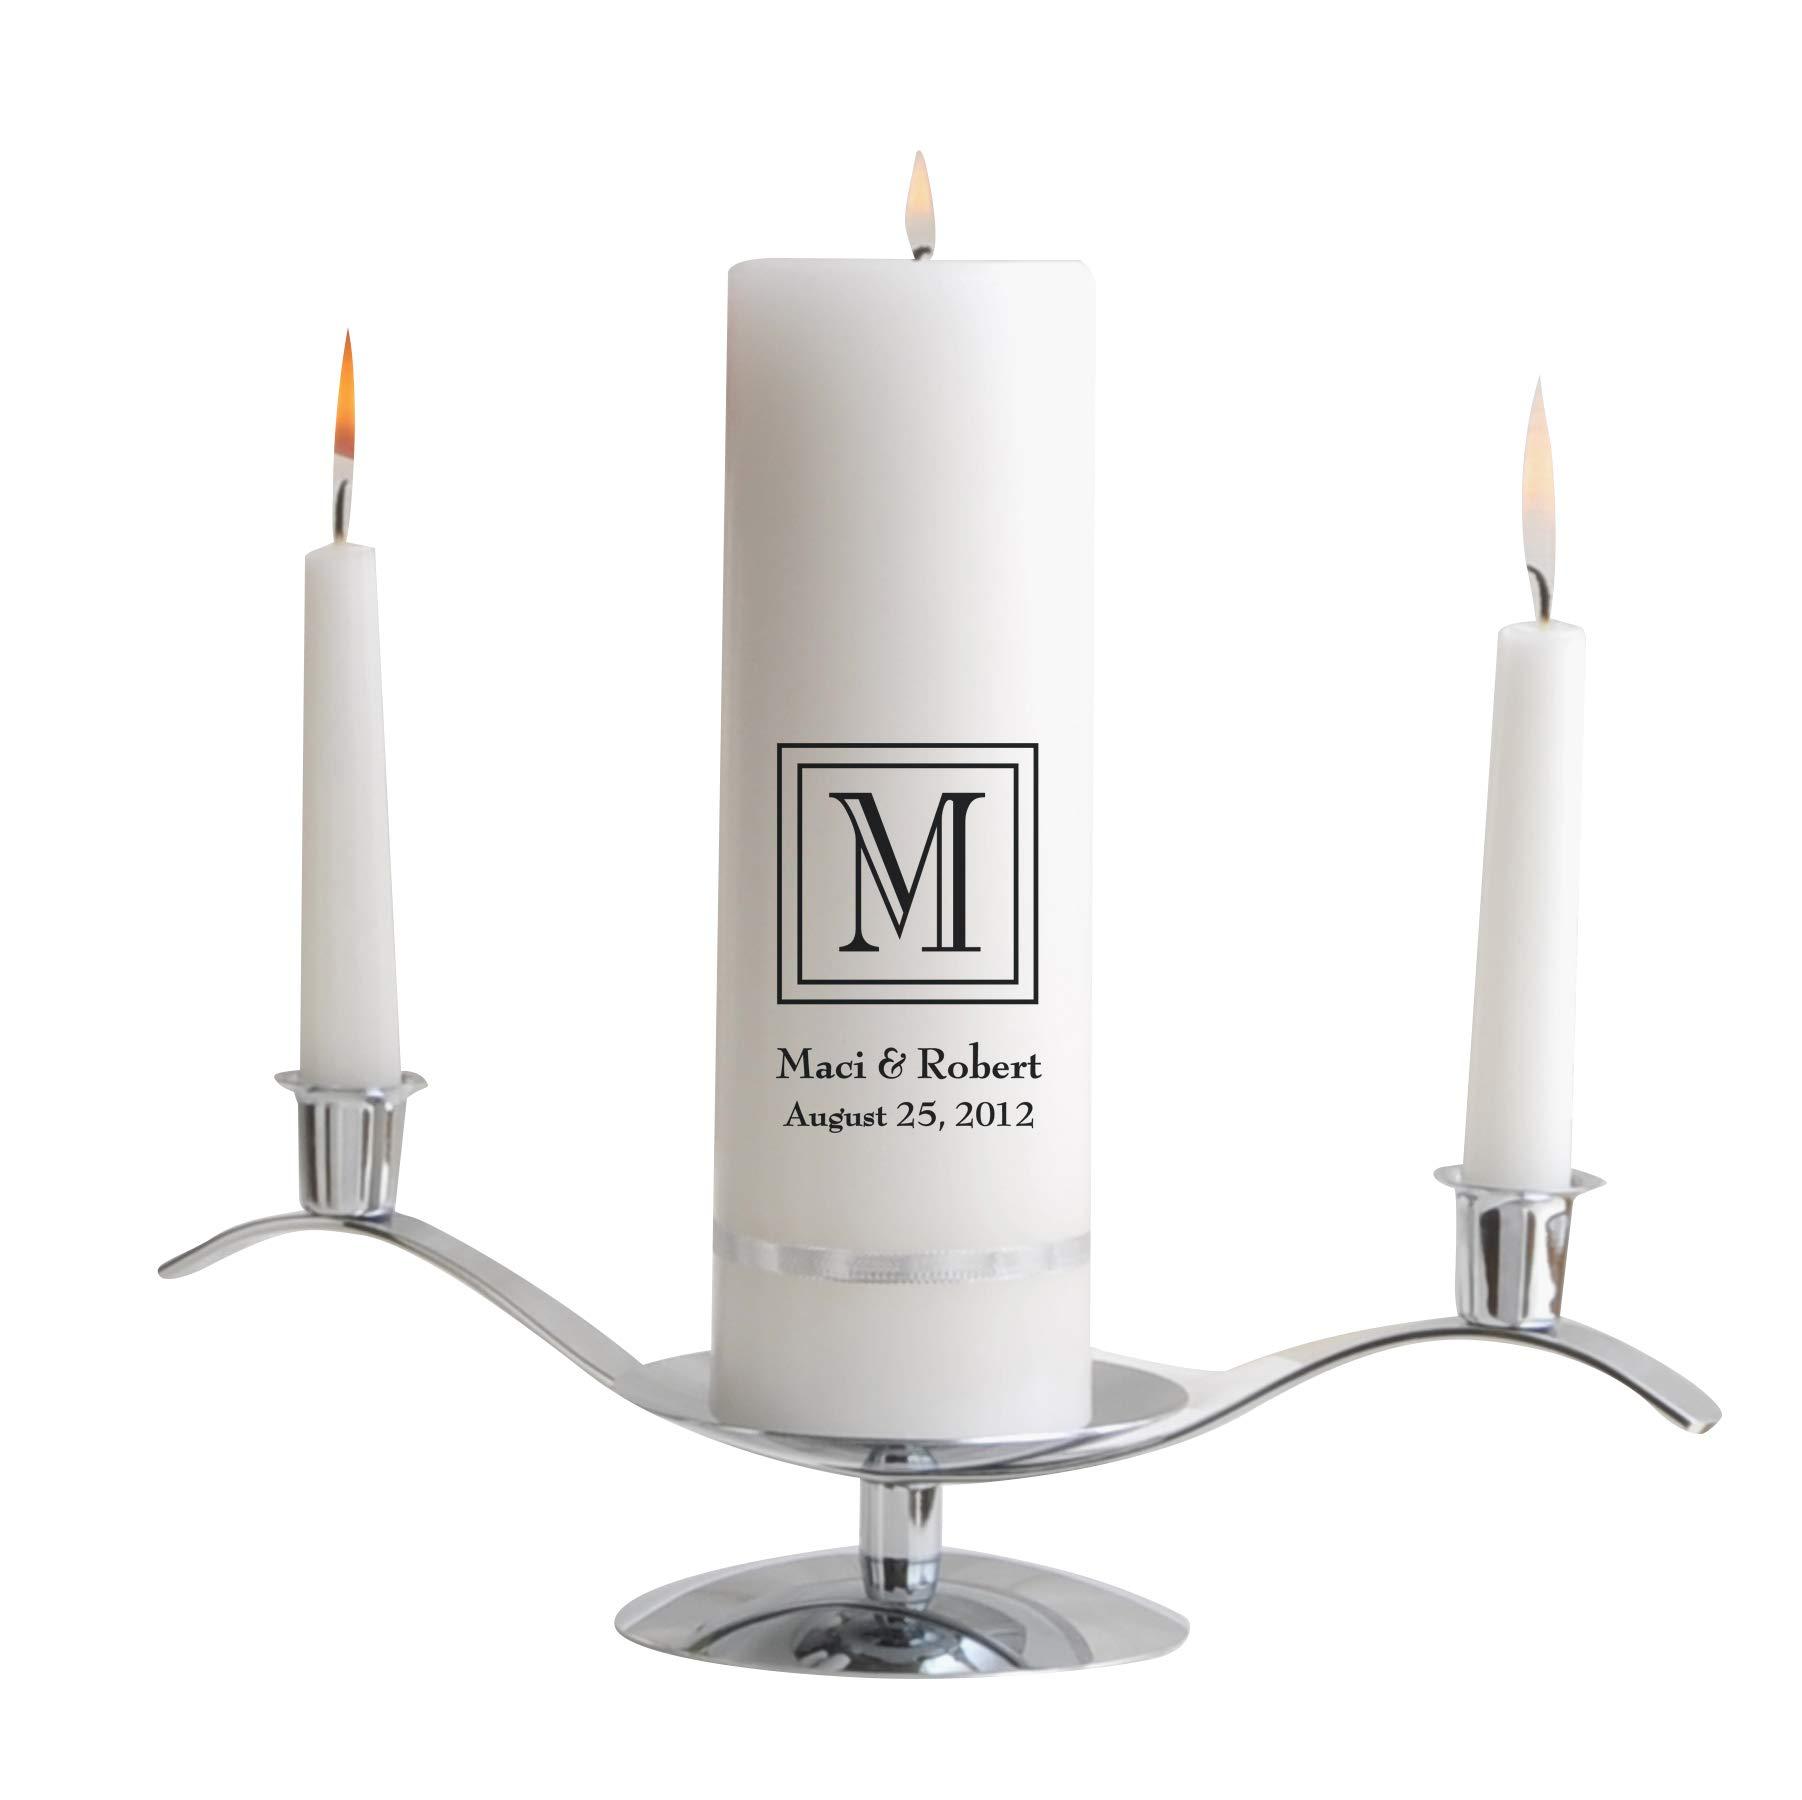 Personalized Wedding Unity Candle - Personalized Unity Candle Set- Classic by A Gift Personalized